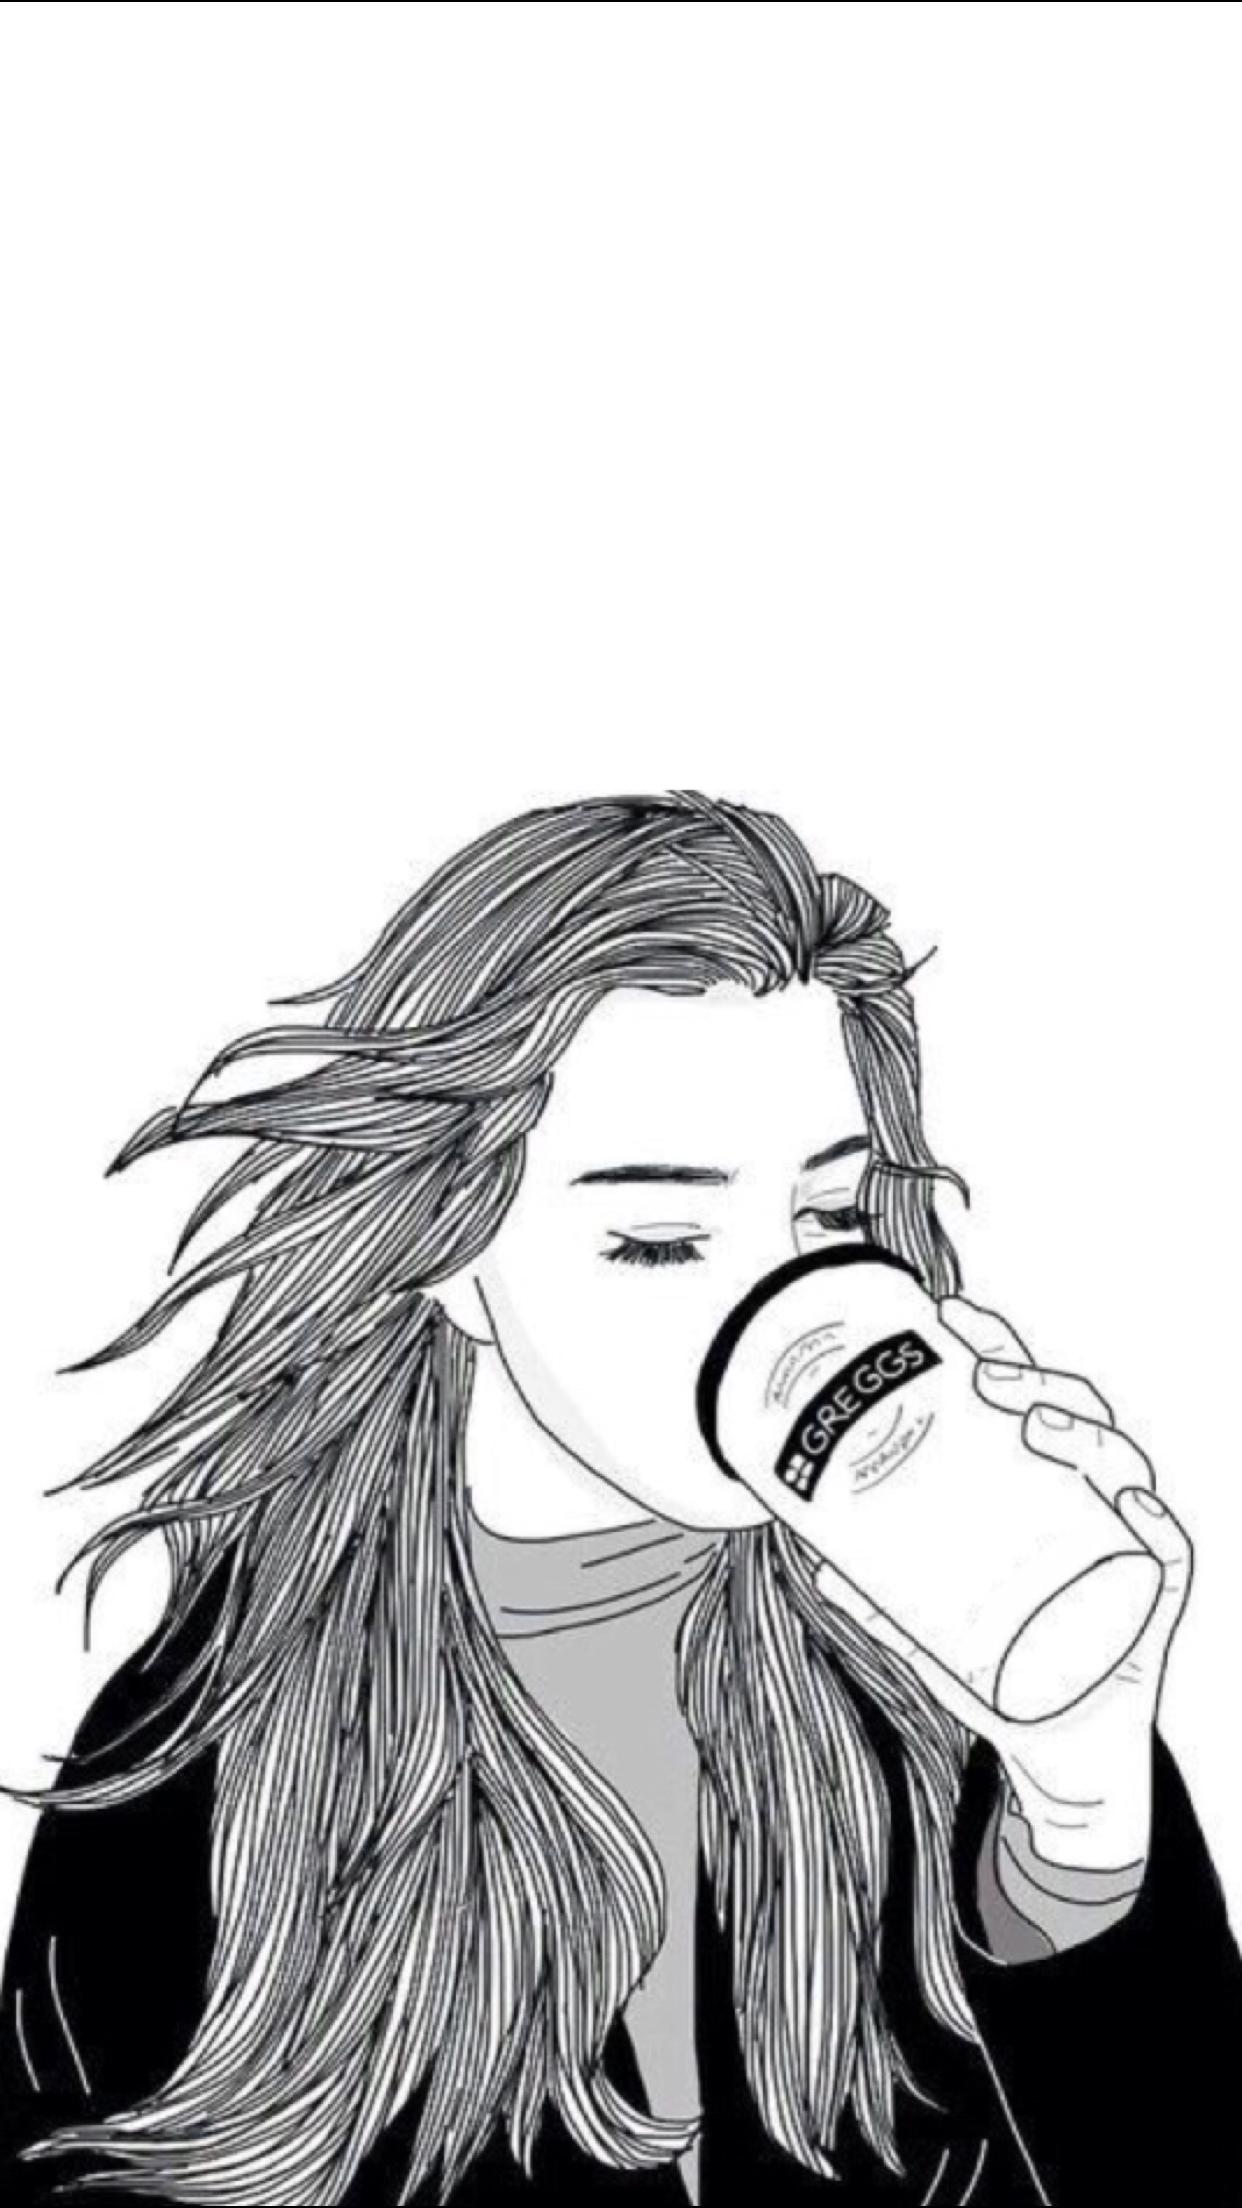 Pin by NIMRA on sketches | Girl sketch, Tumblr girl drawing, Drawings